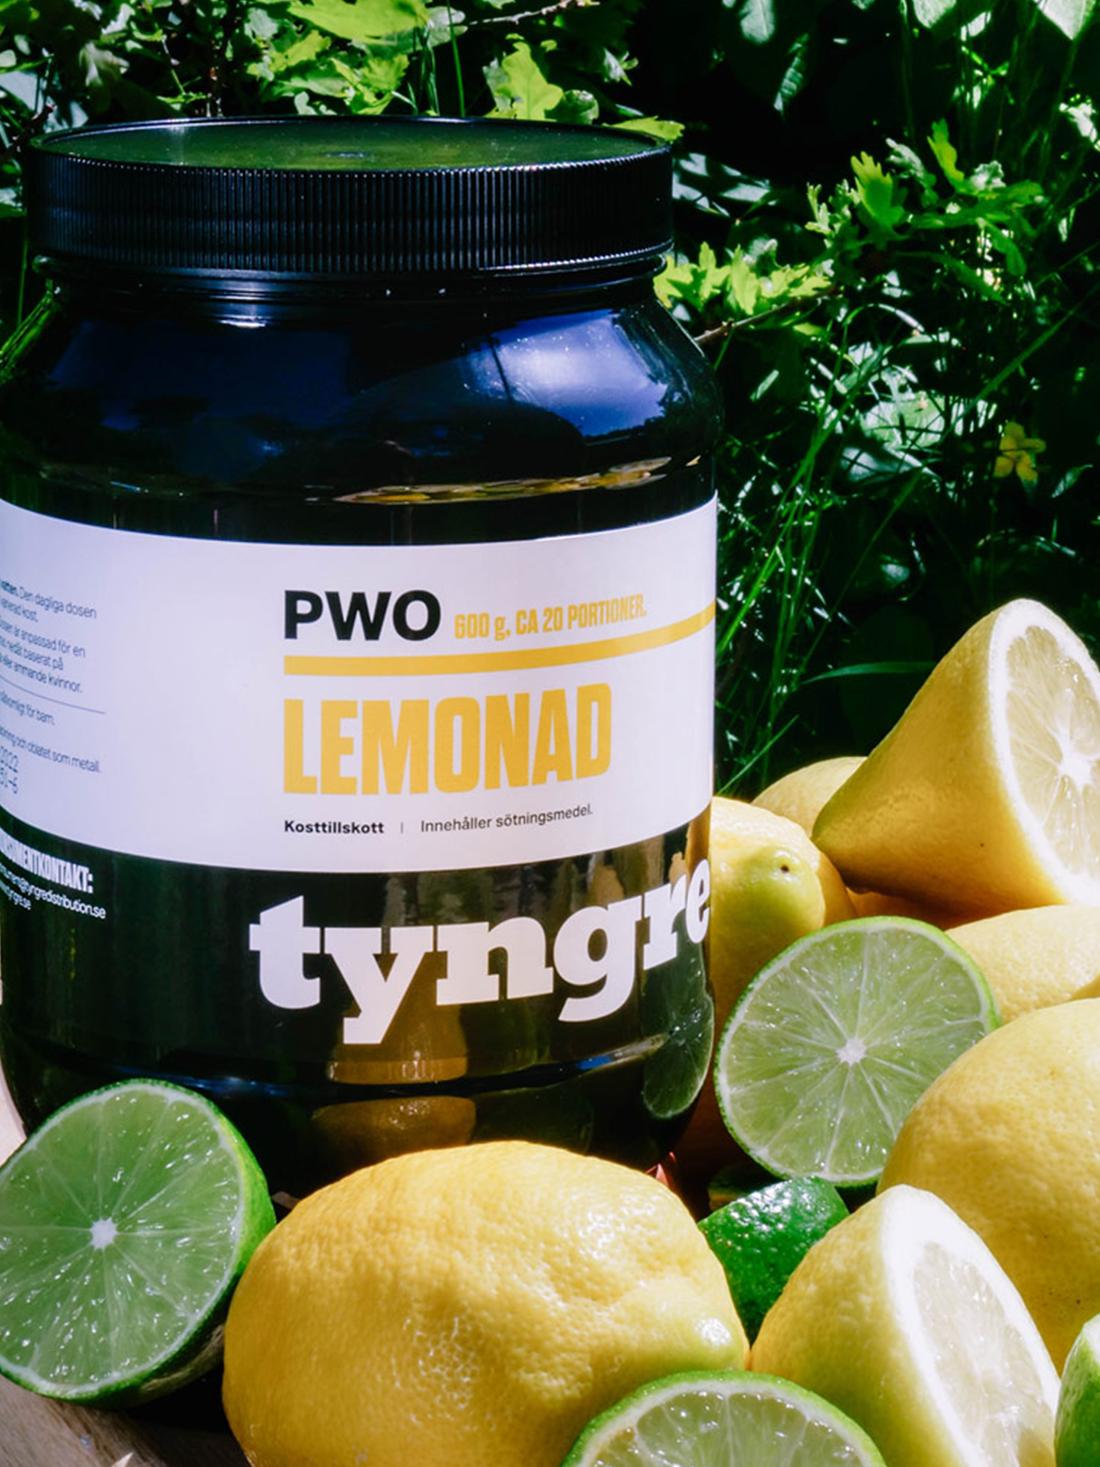 PWO Lemonad